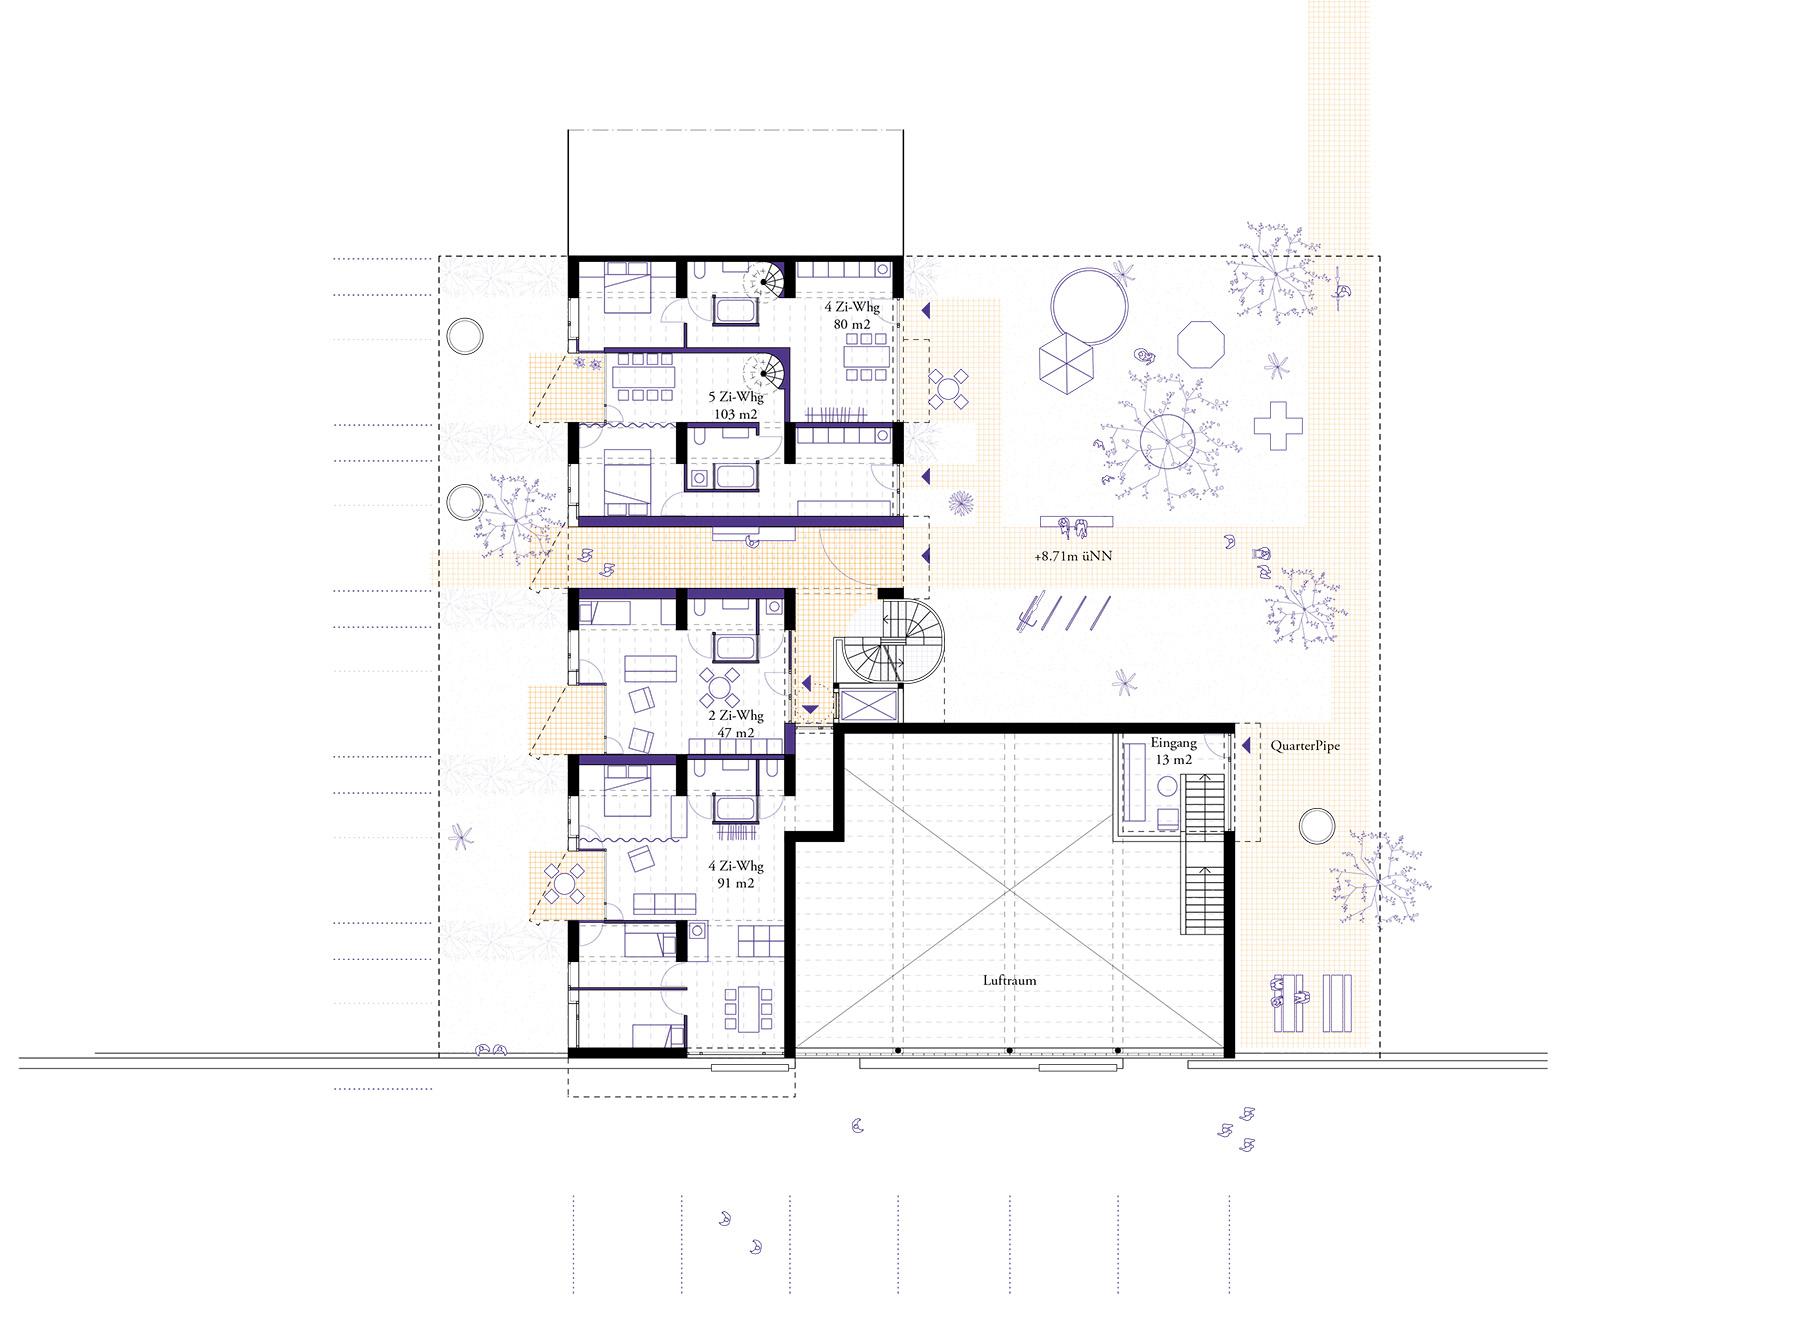 ground floor street level